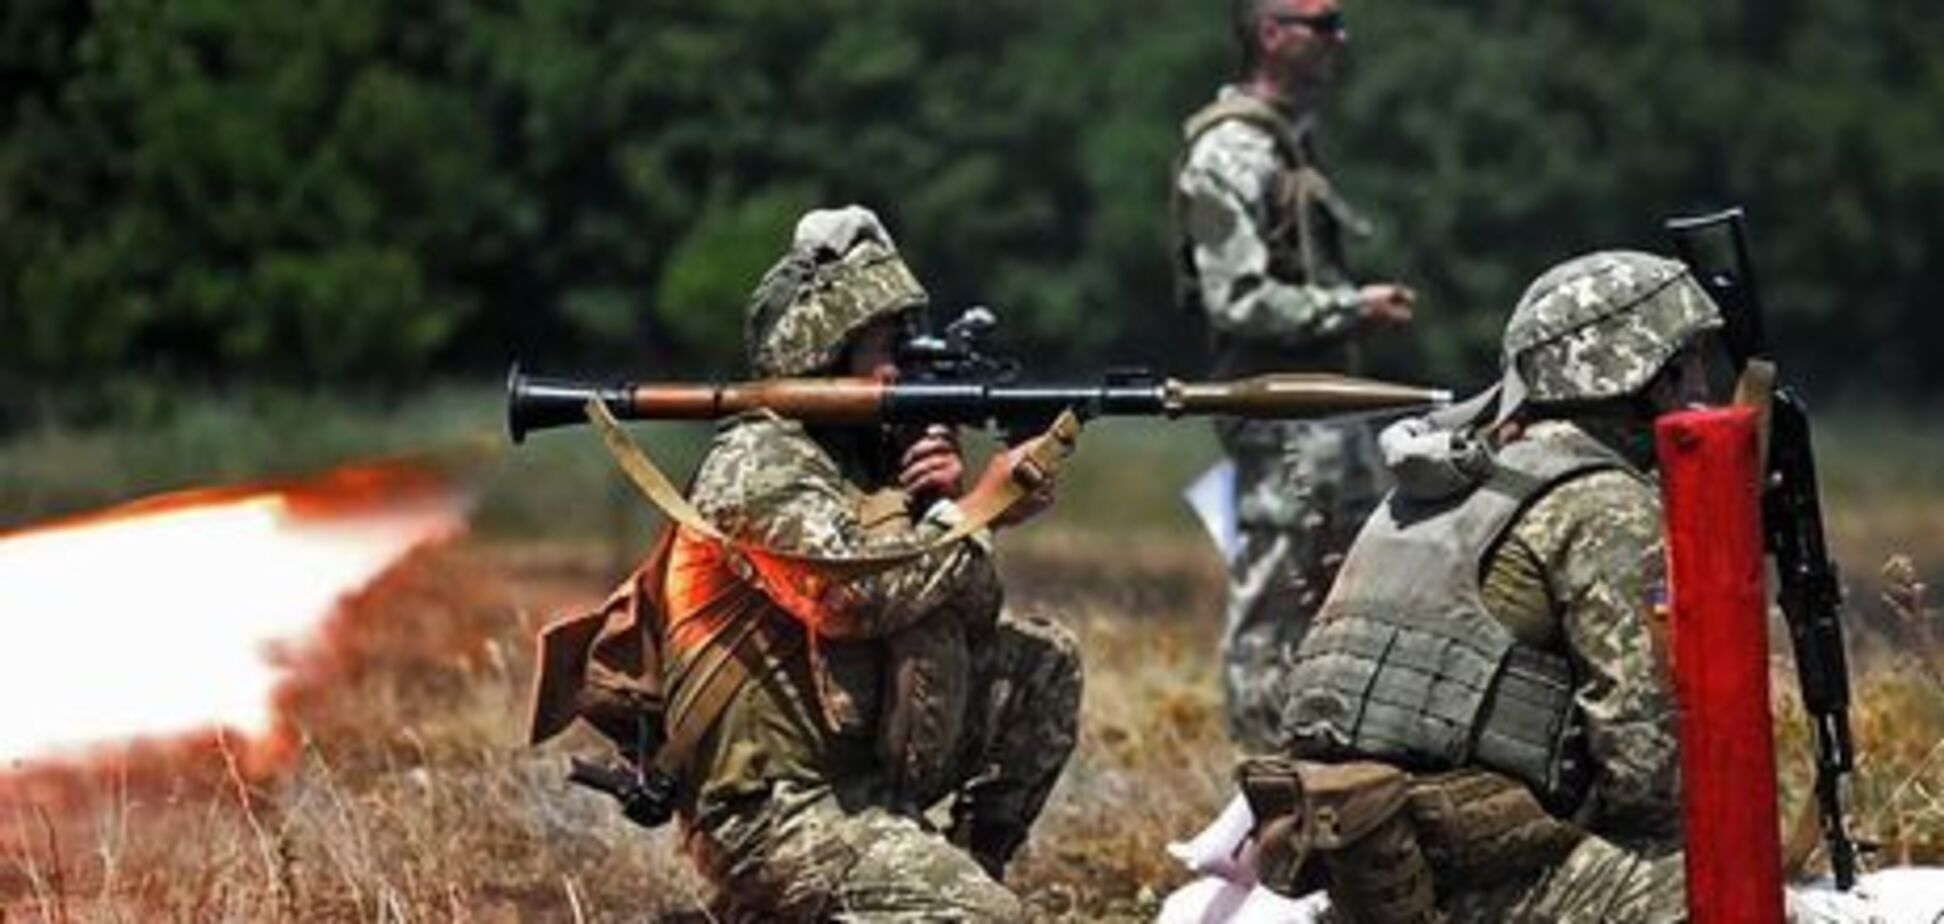 В ''бригаде-200'' пополнение: ВСУ дали жесткий отпор ''Л/ДНР'' на Донбассе